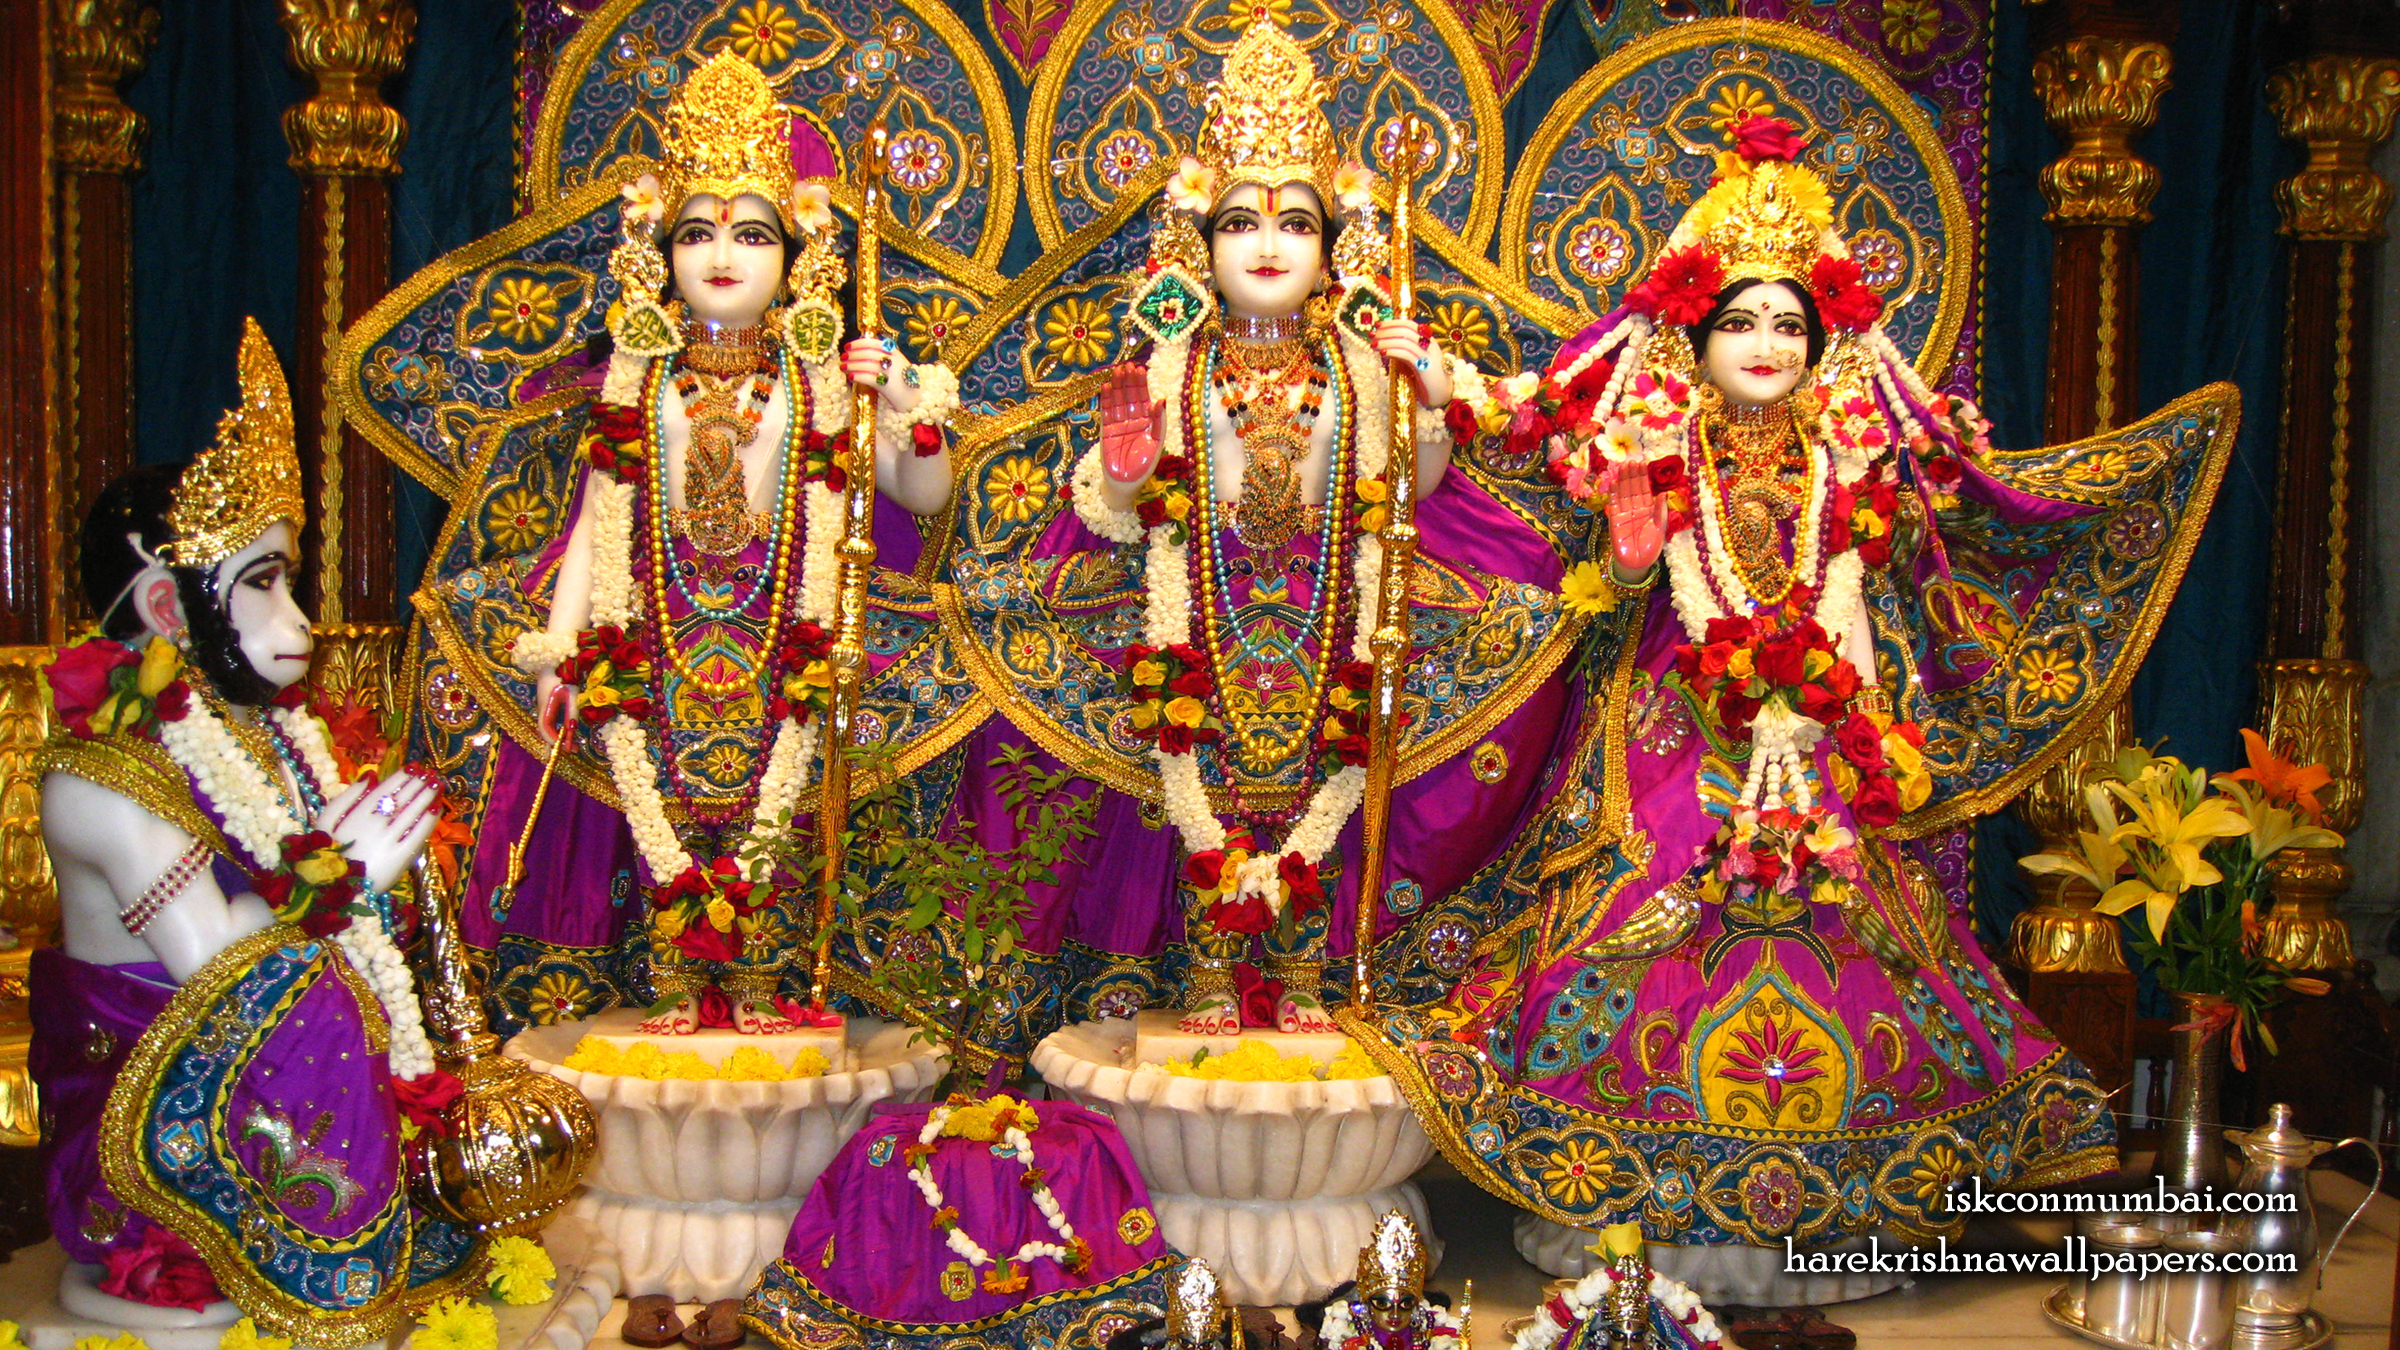 Sri Sri Sita Rama Laxman Hanuman Wallpaper (006) Size 2400x1350 Download